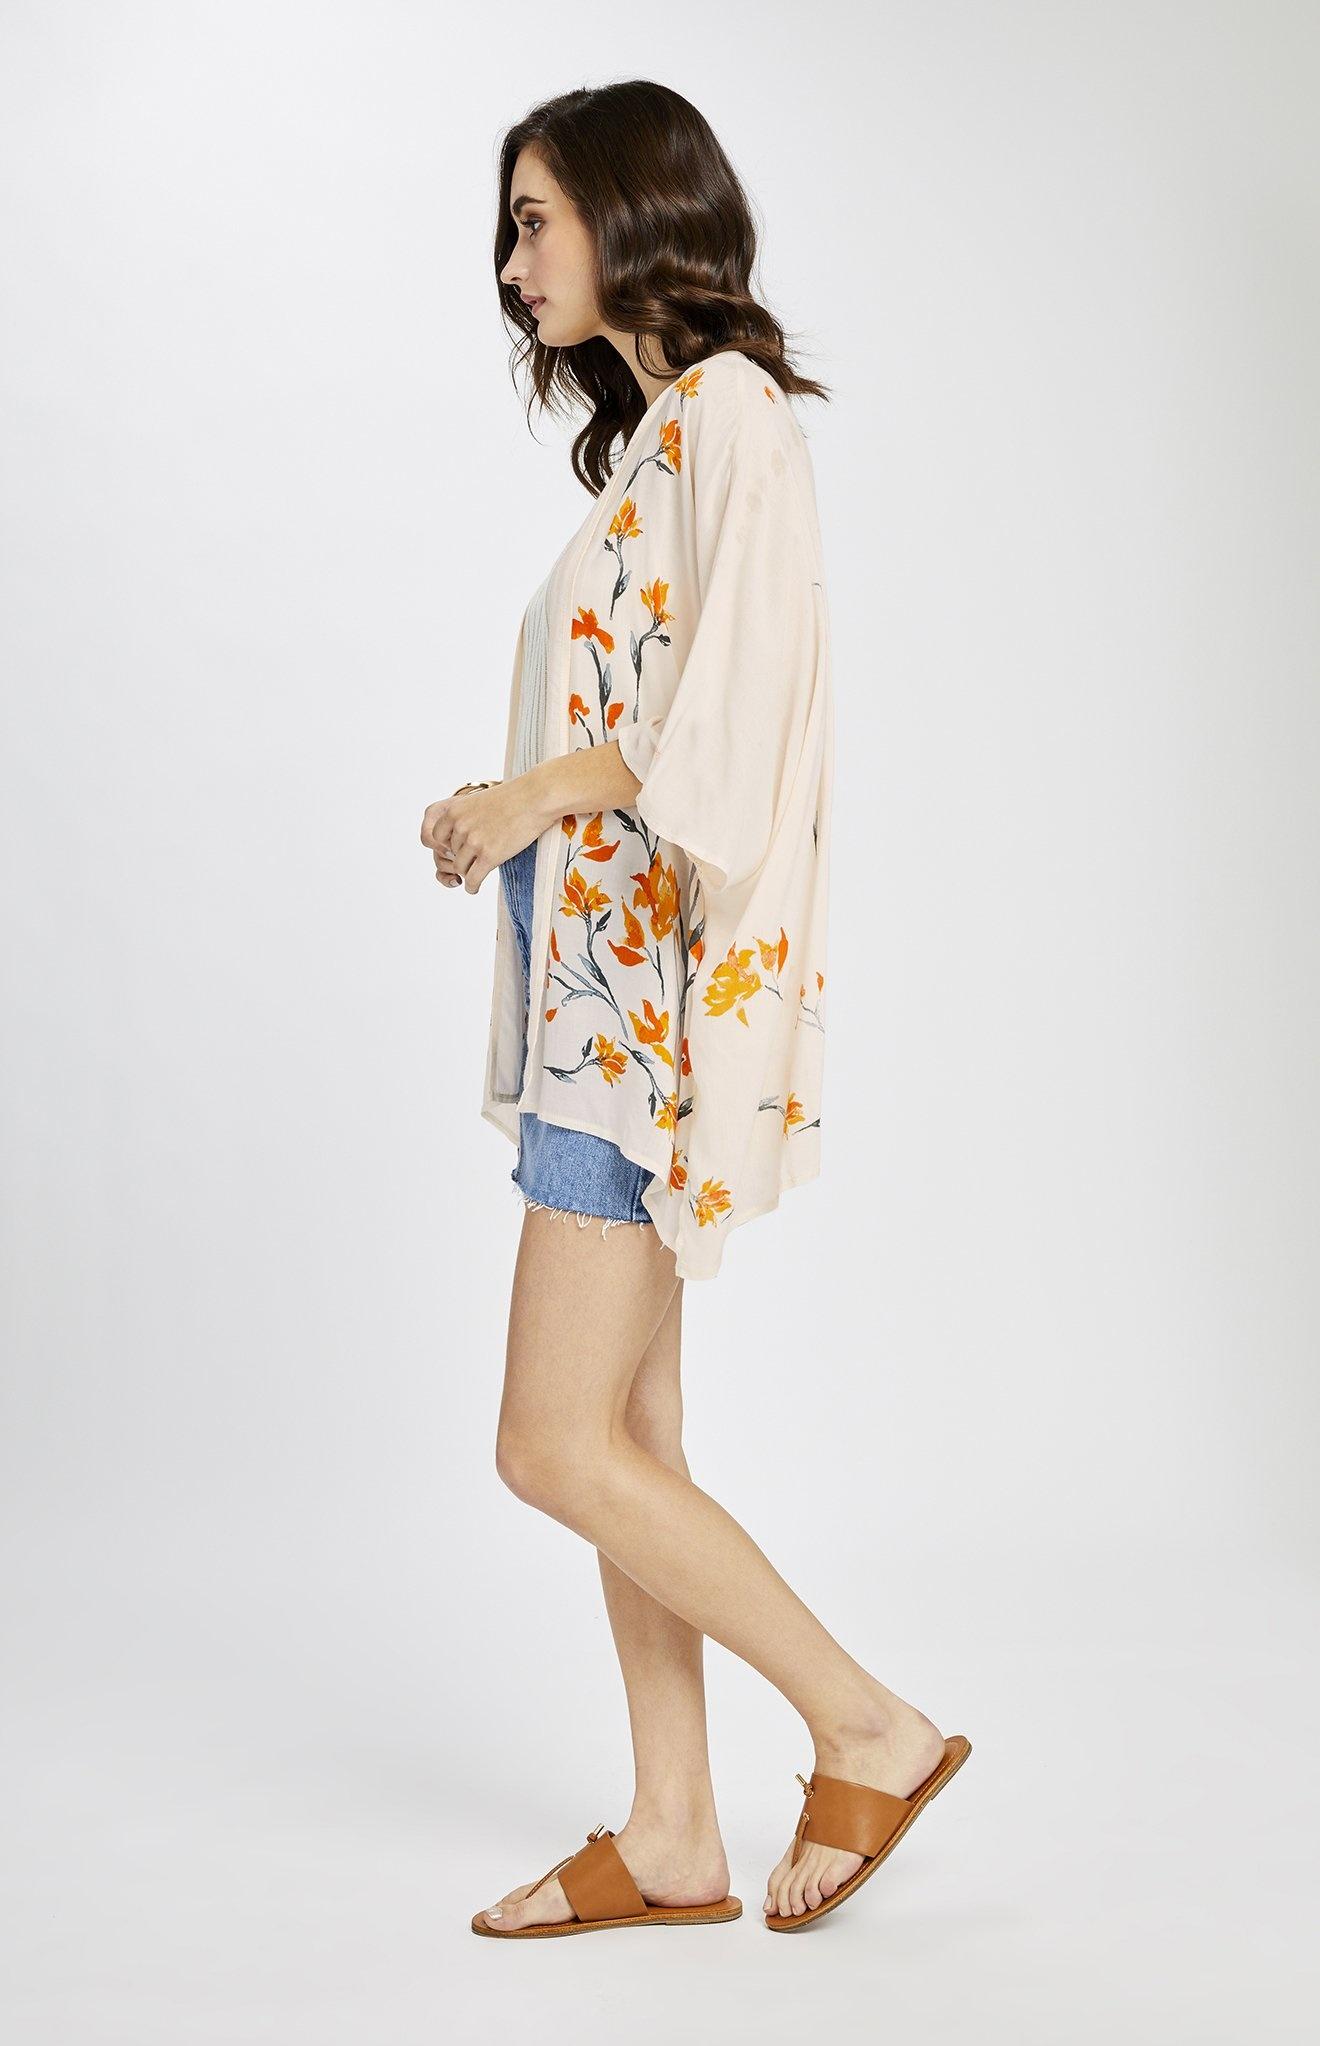 Gentlefawn Tranquil Kimono